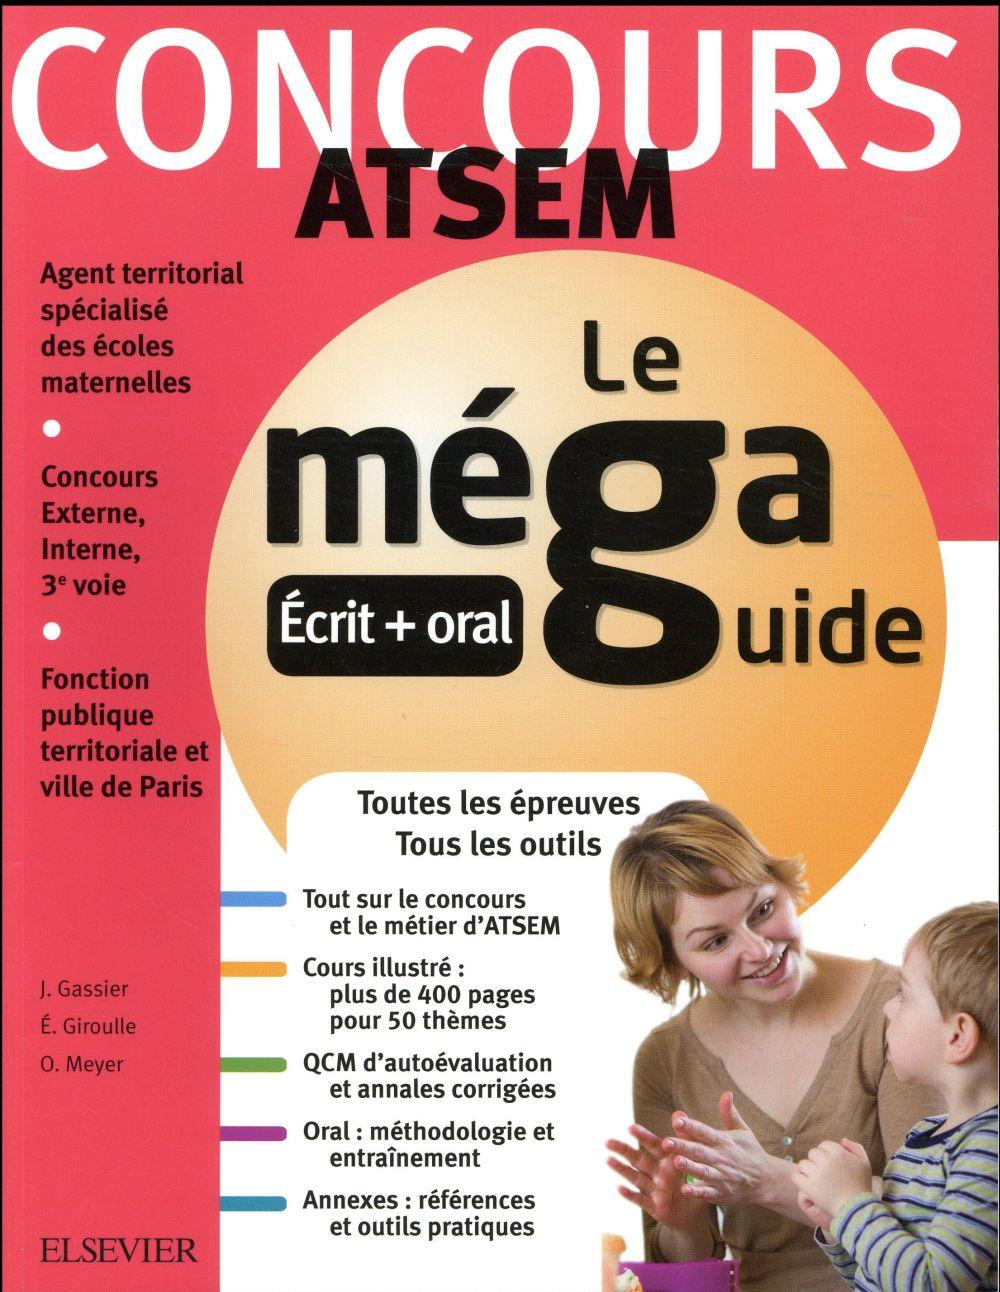 MEGA GUIDE  -  CONCOURS ATSEM Giroulle Évelyne Elsevier Masson